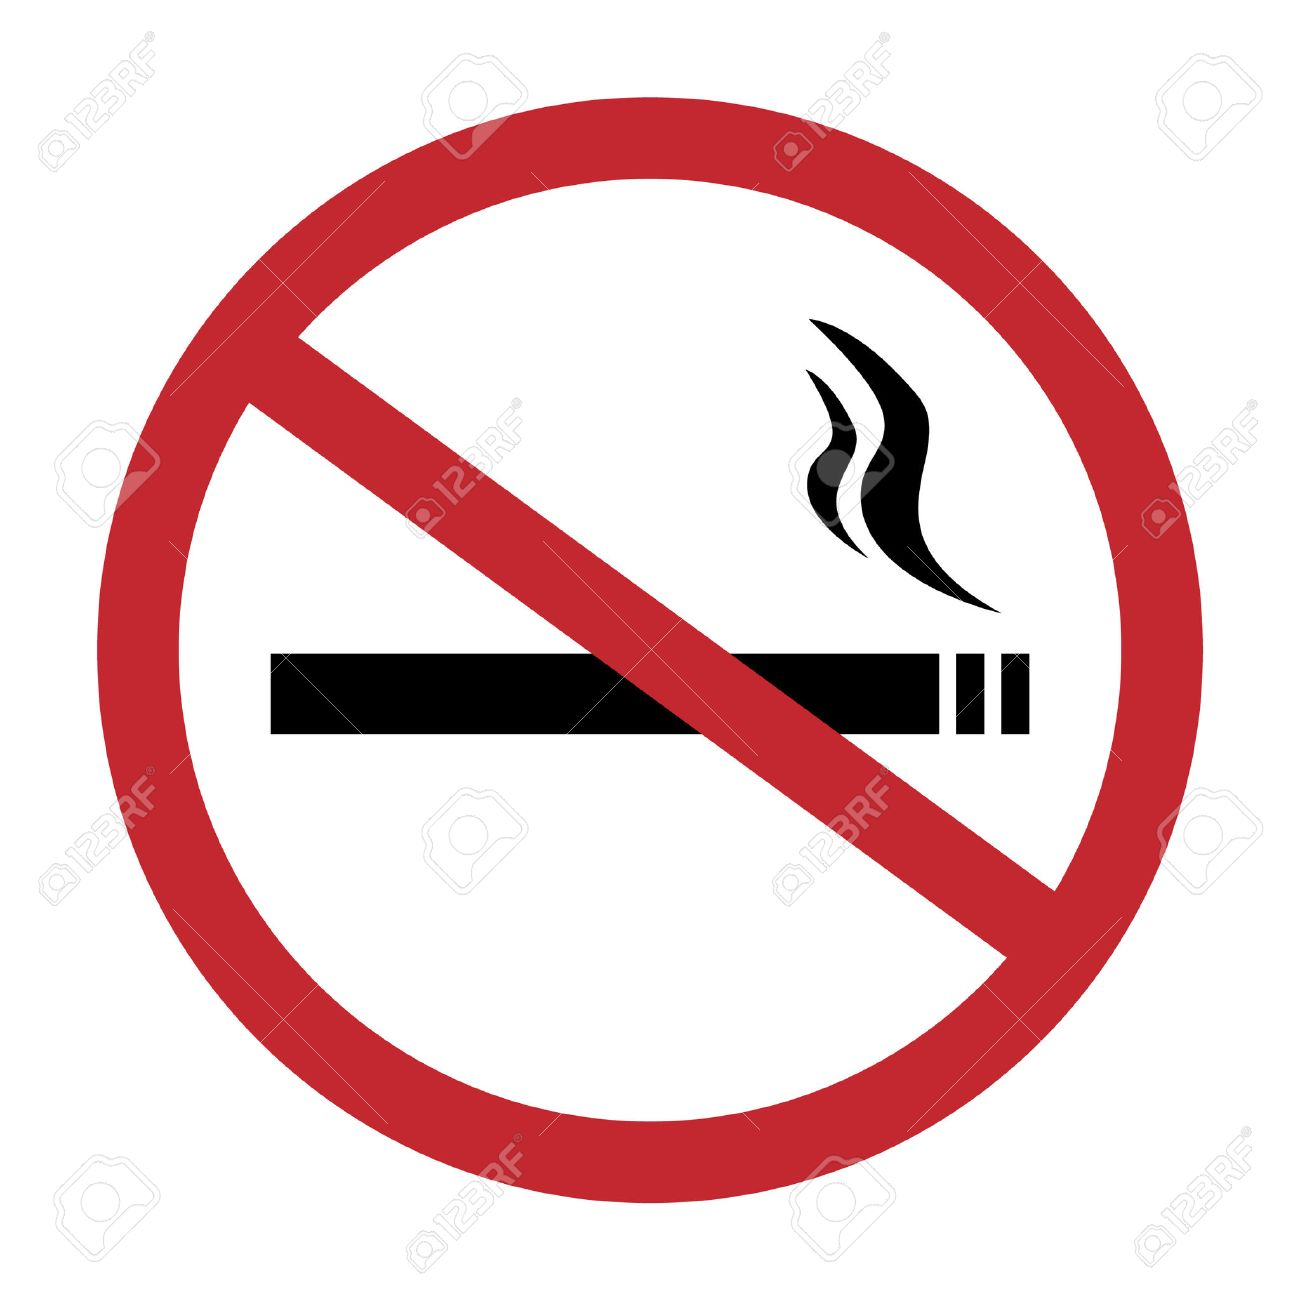 round no smoking sign quit smoking smoke free no smoking icon rh 123rf com no smoking vector free download no smoking vector image